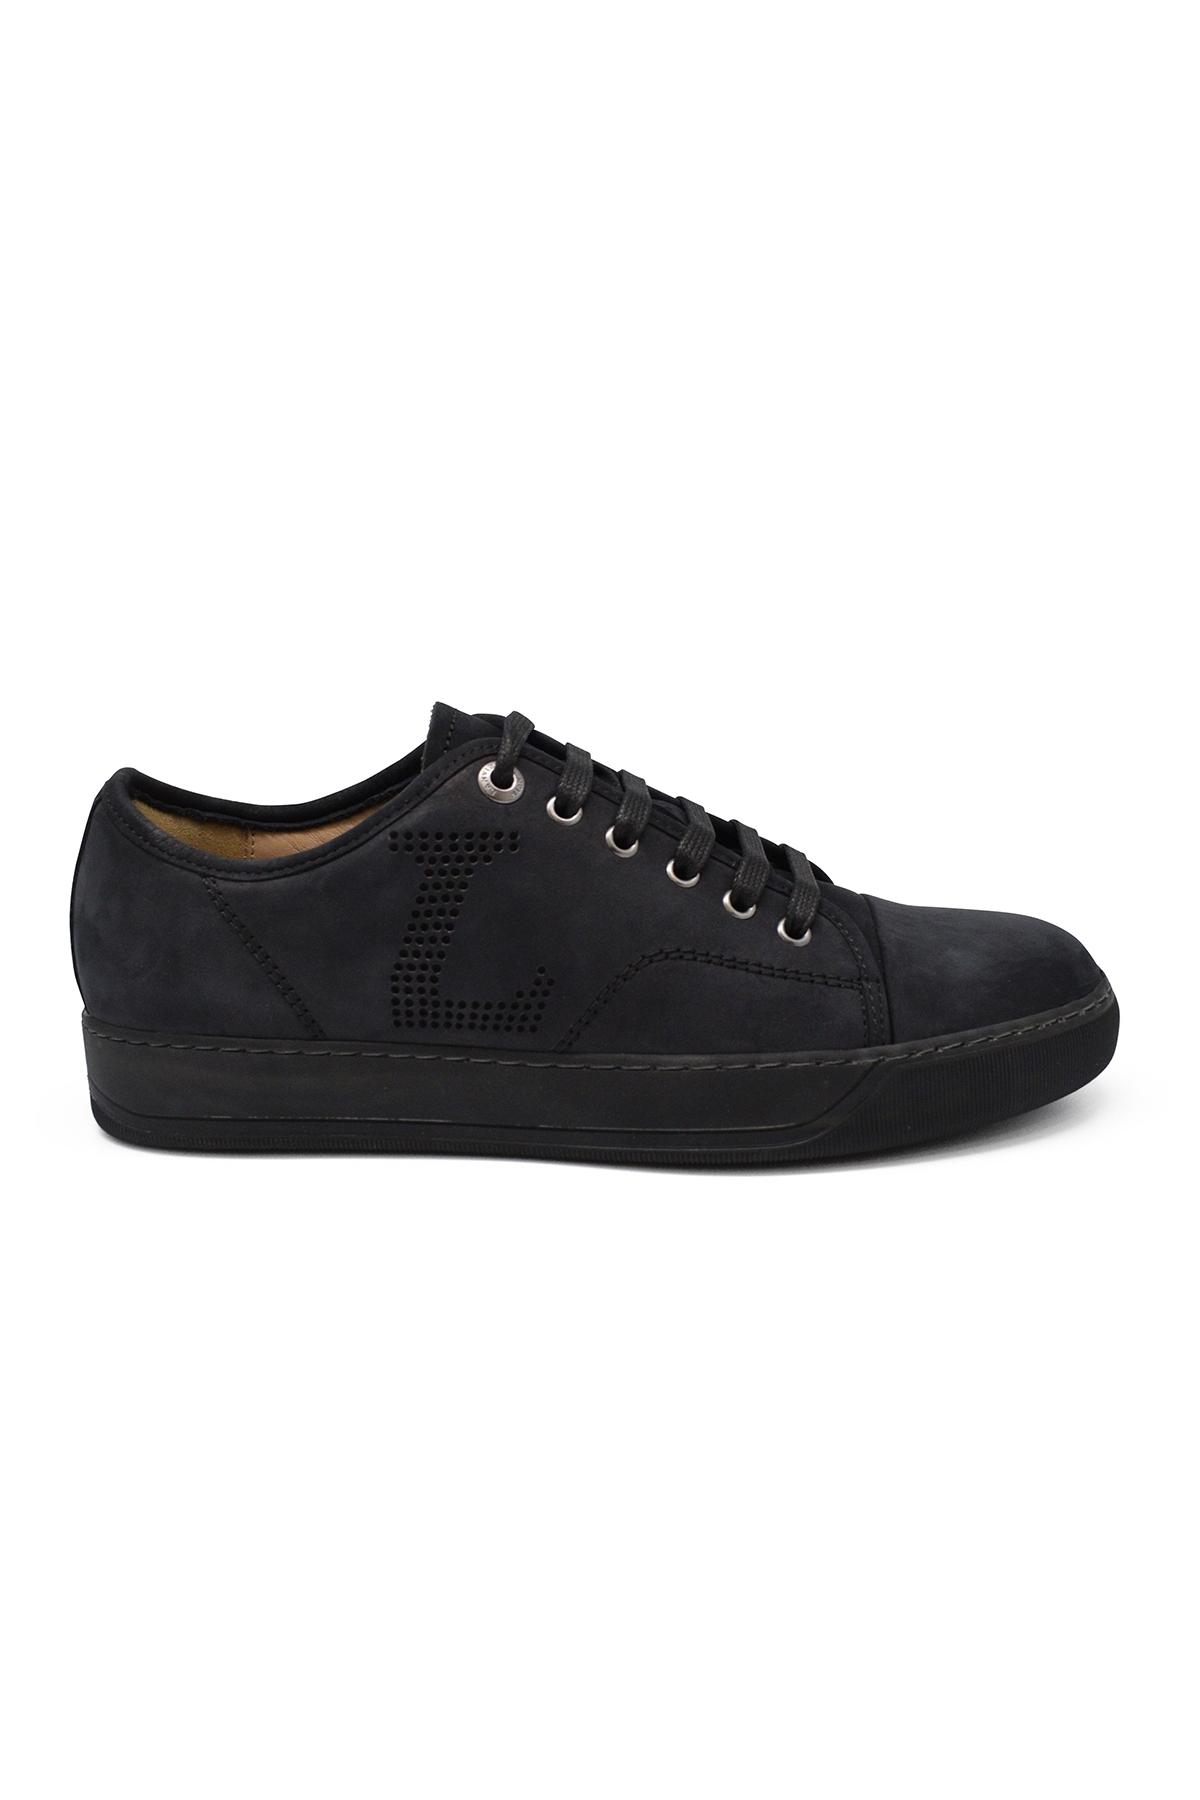 DBB1 sneakers